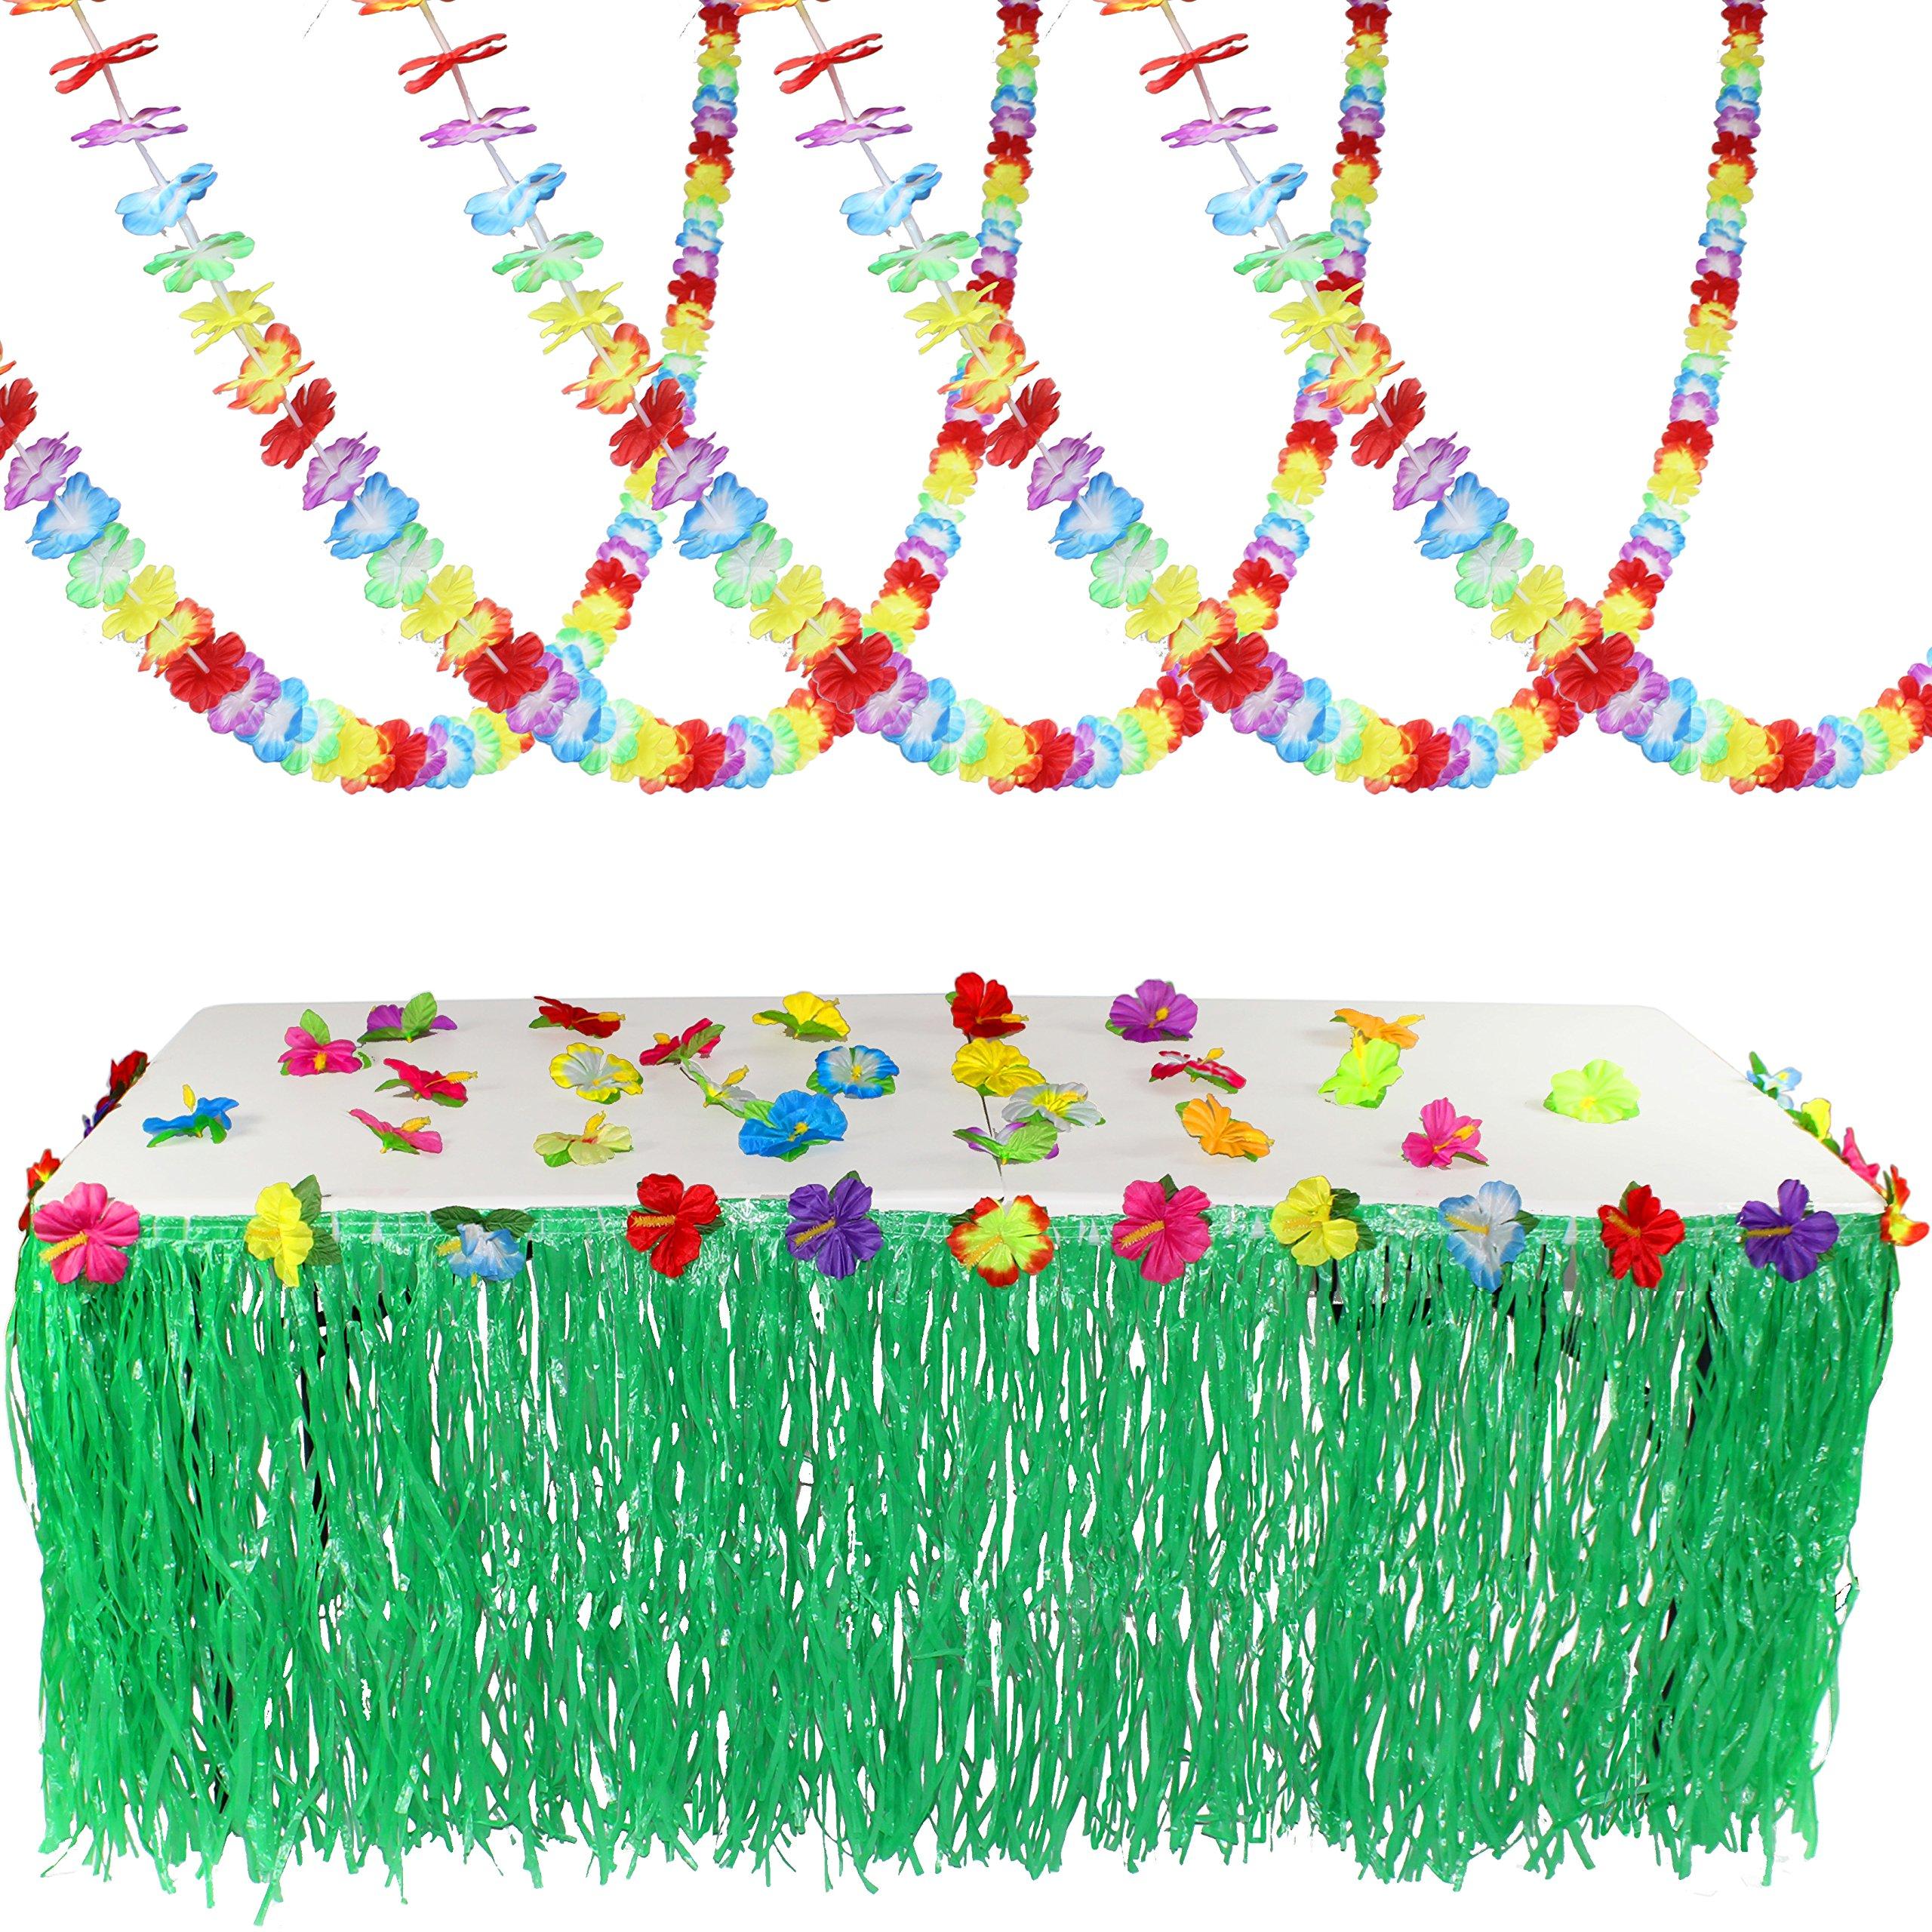 Joyin Toy Luau Tropical Hawaiian Party Decoration Set Including 100 ft Flower Lei Garland, 36 Hibiscus Flowers and 9 ft Luau Table Skirt